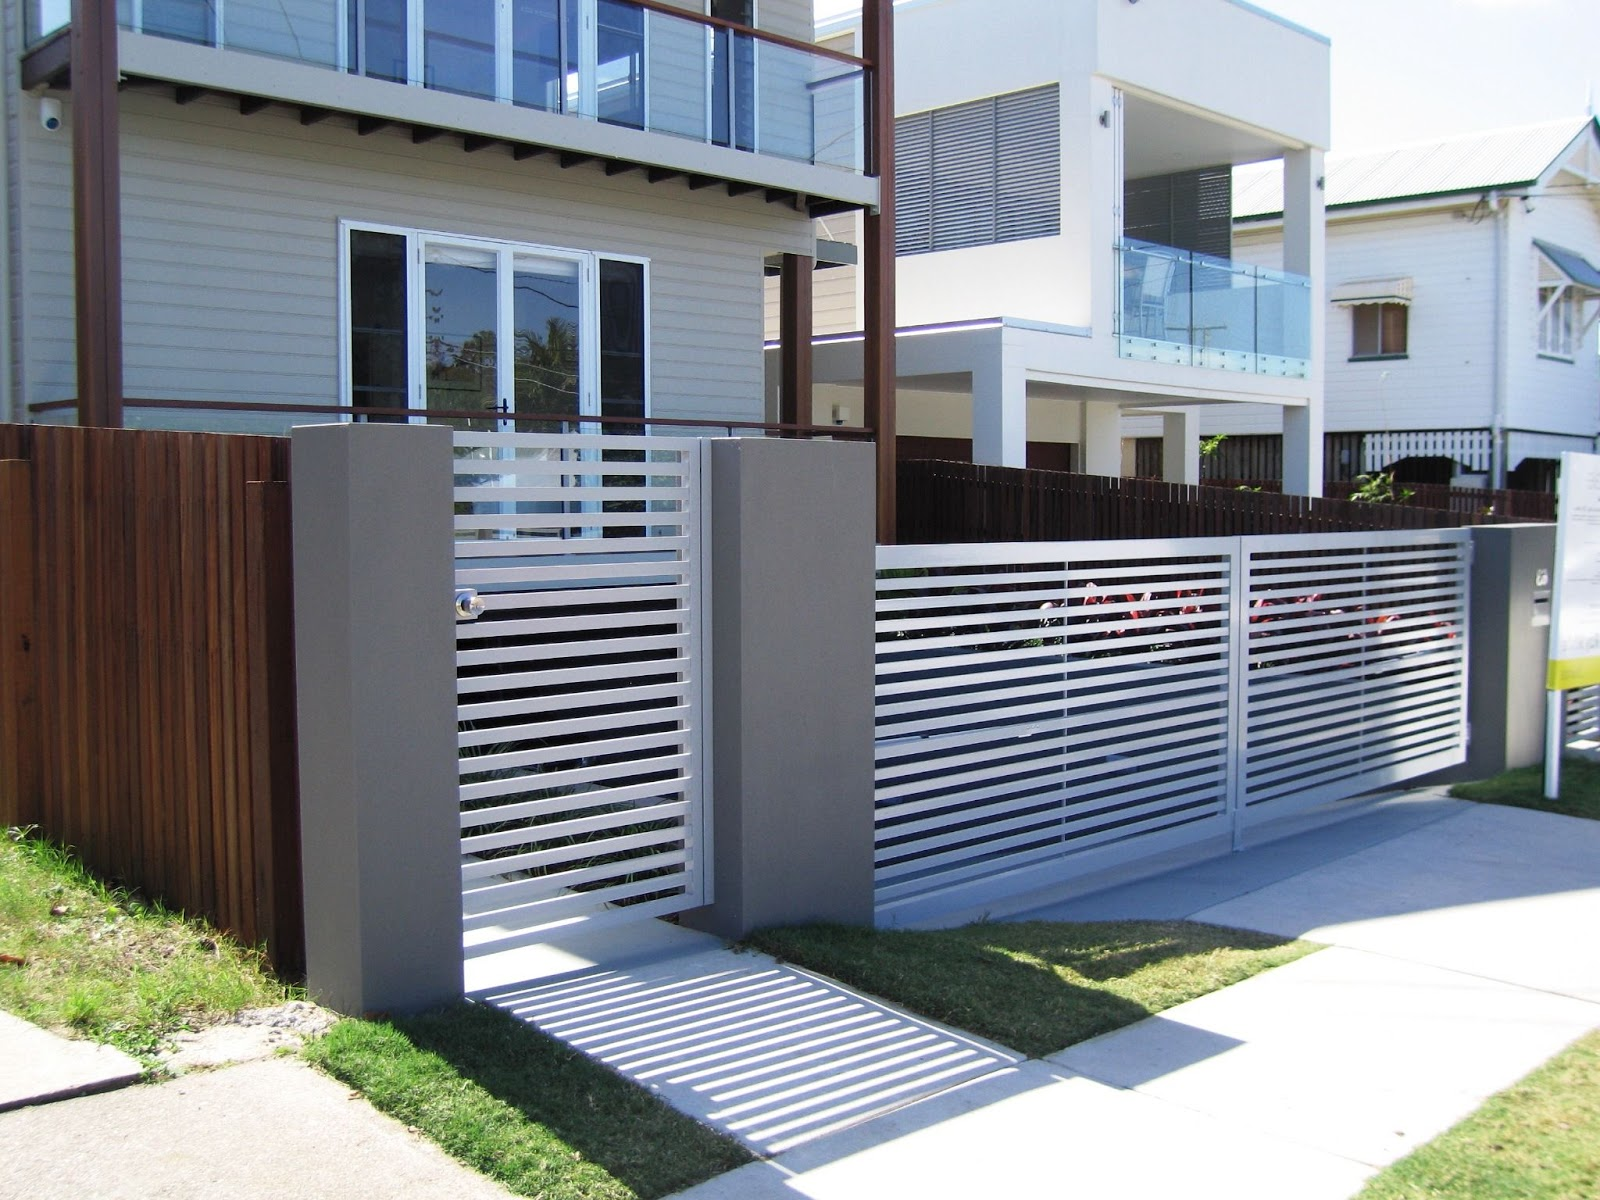 35 kombinasi warna cat pagar rumah minimalis hijau ungu